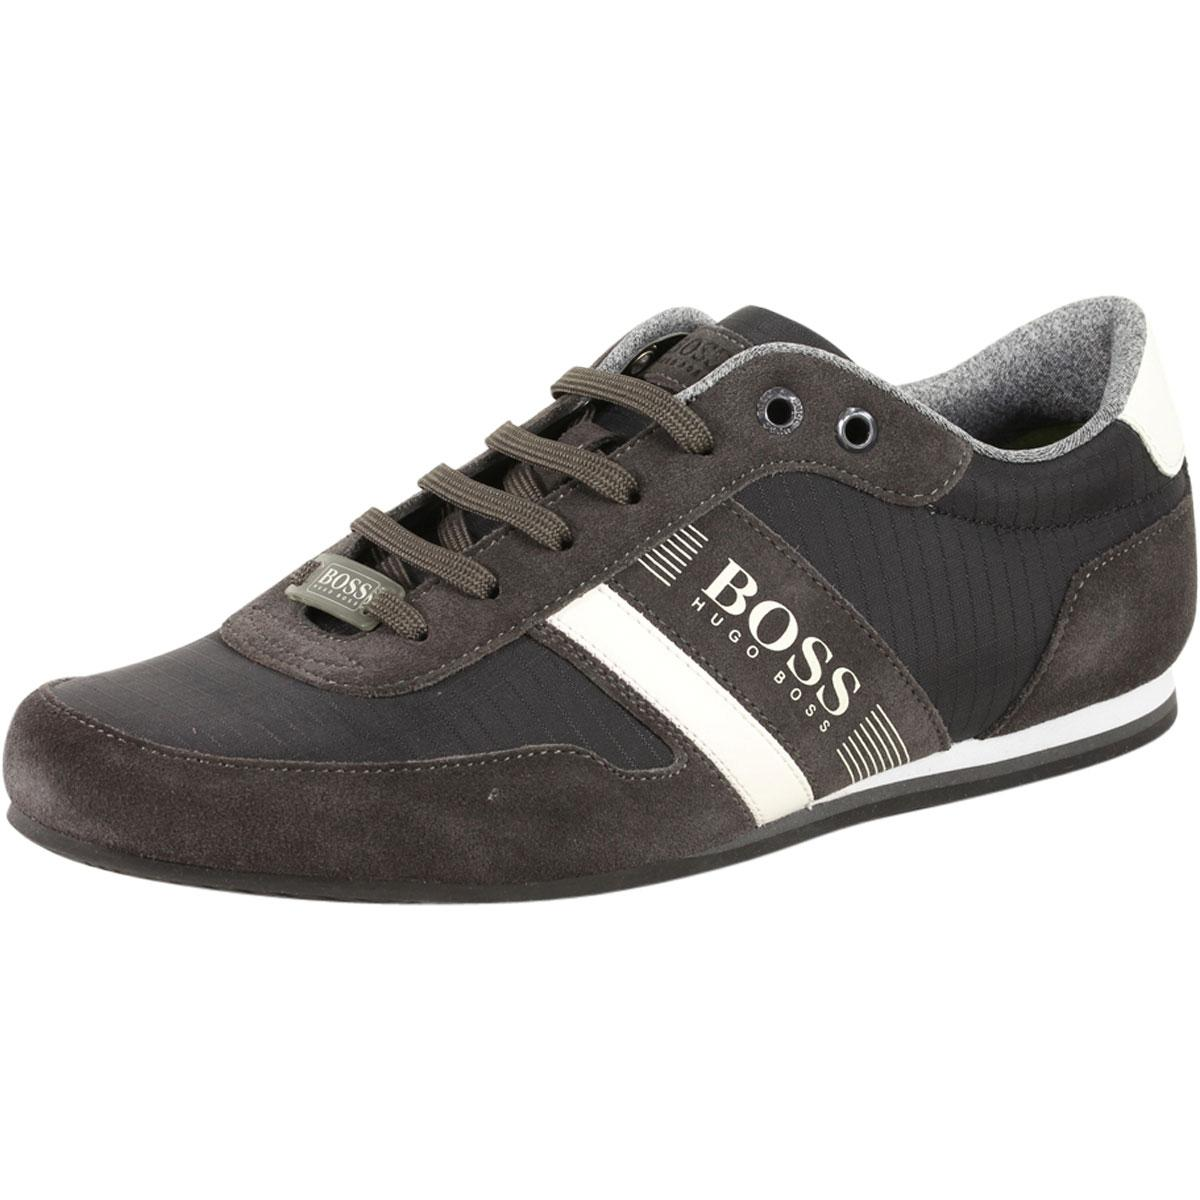 0c5385de2fe Hugo Boss Men s Lighter Memory Foam Trainers Sneakers Shoes